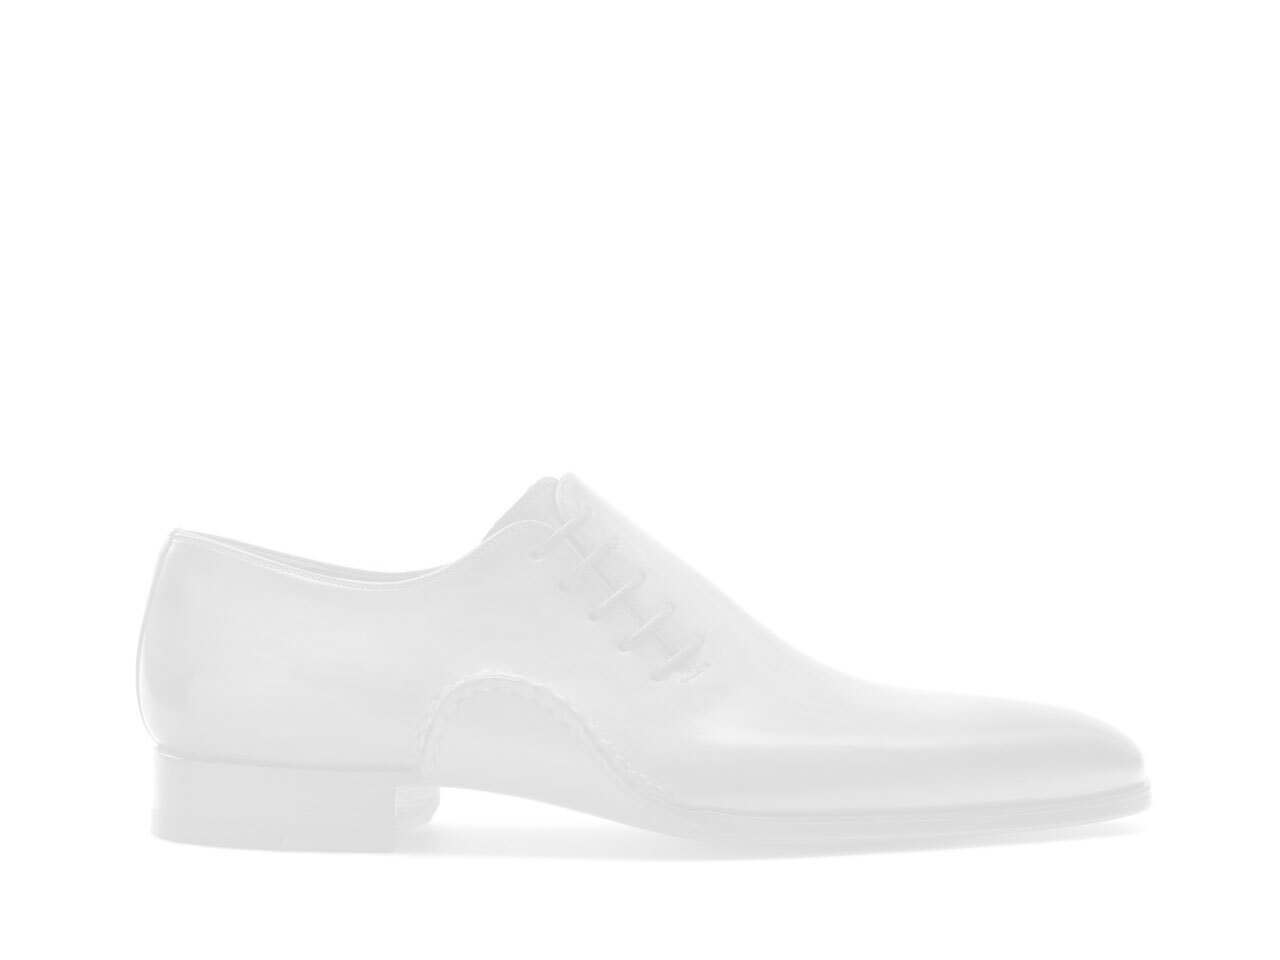 Sole of the Magnanni Richards Cuero Men's Tassel Loafers